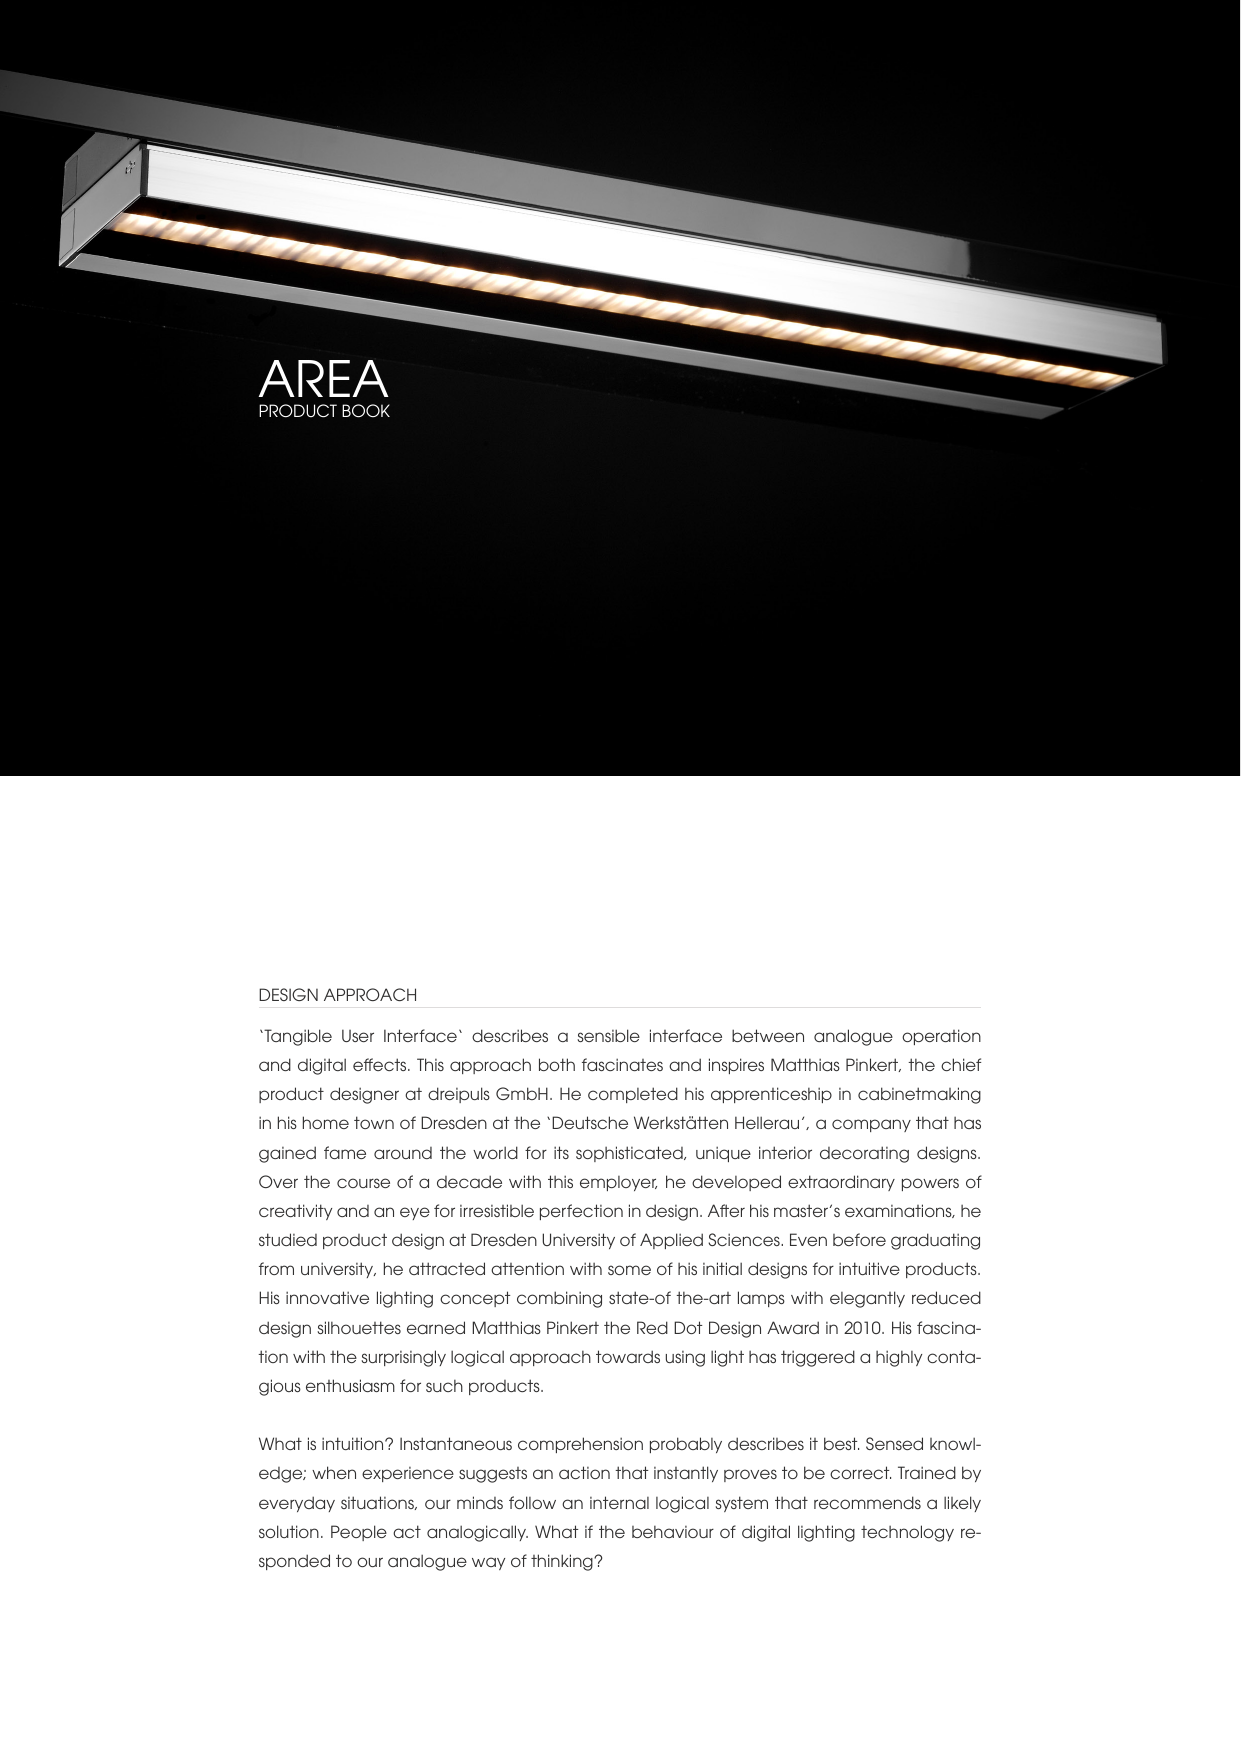 dreipuls Product Book AREA